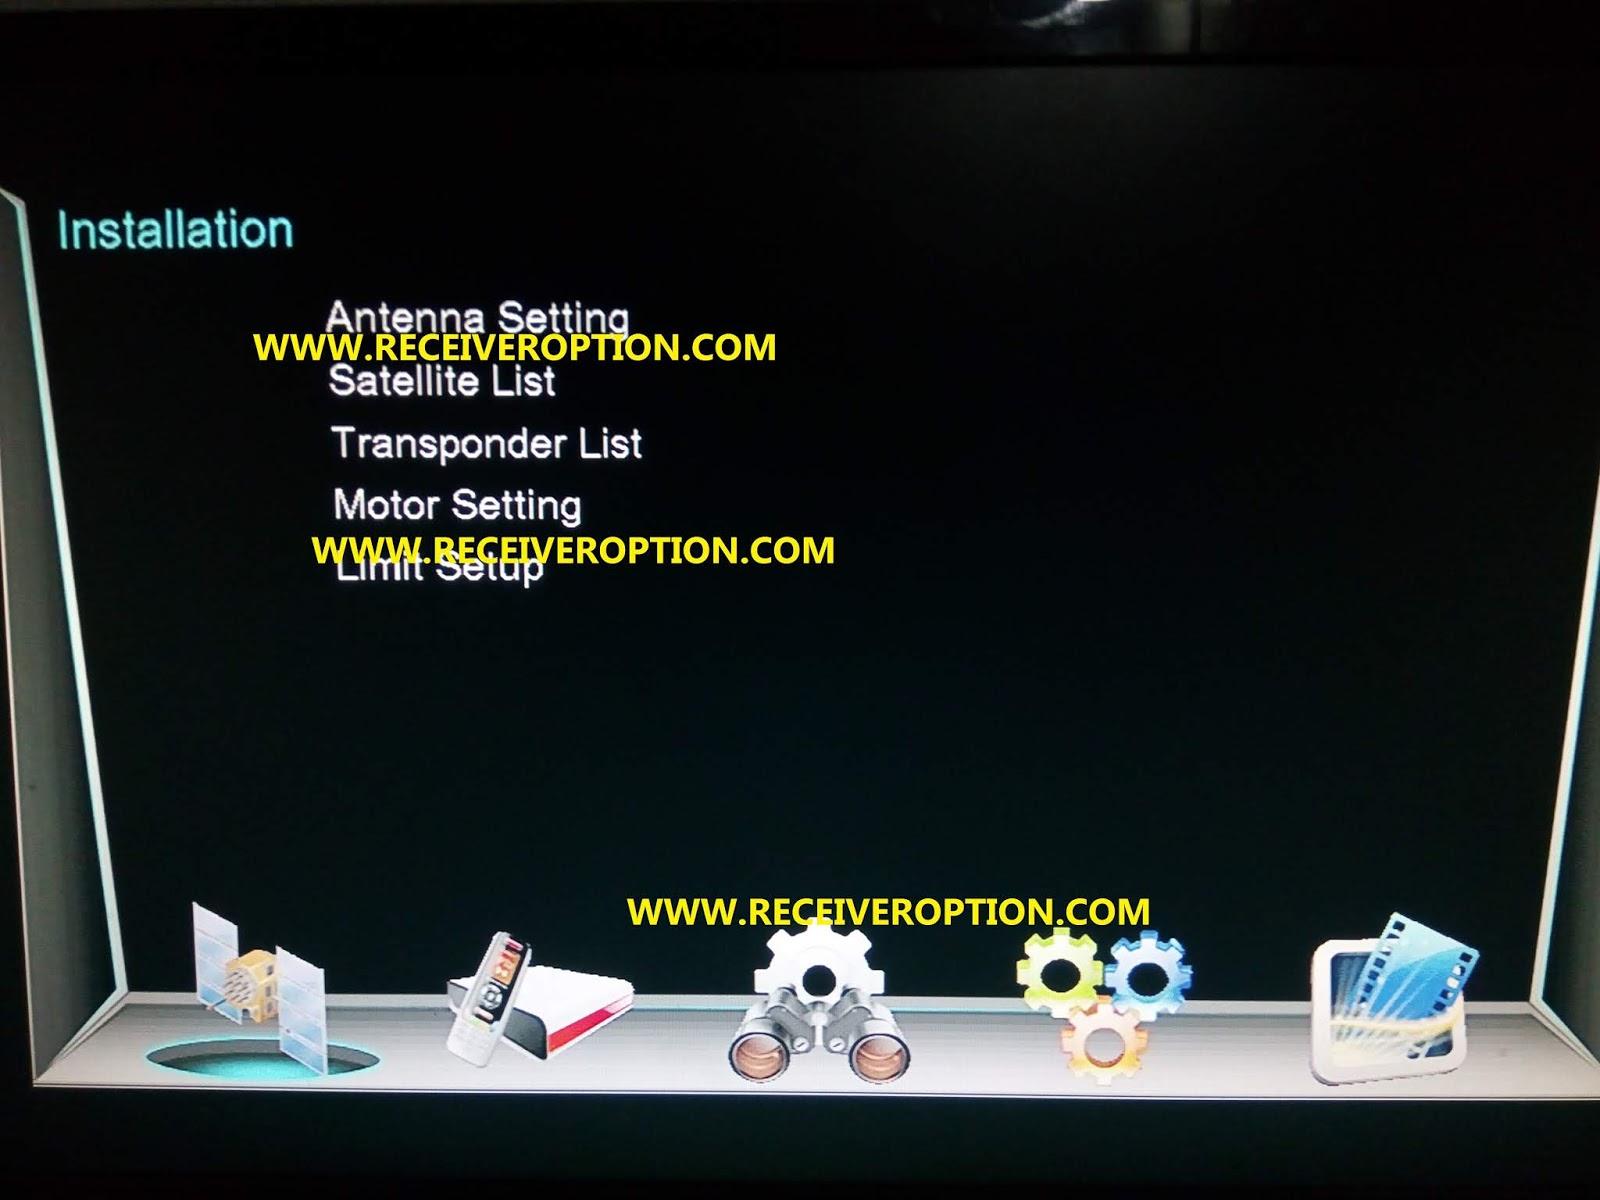 NEOSET i 5000 EXTREME 4K RECEIVER POWERVU KEY NEW SOFTWARE